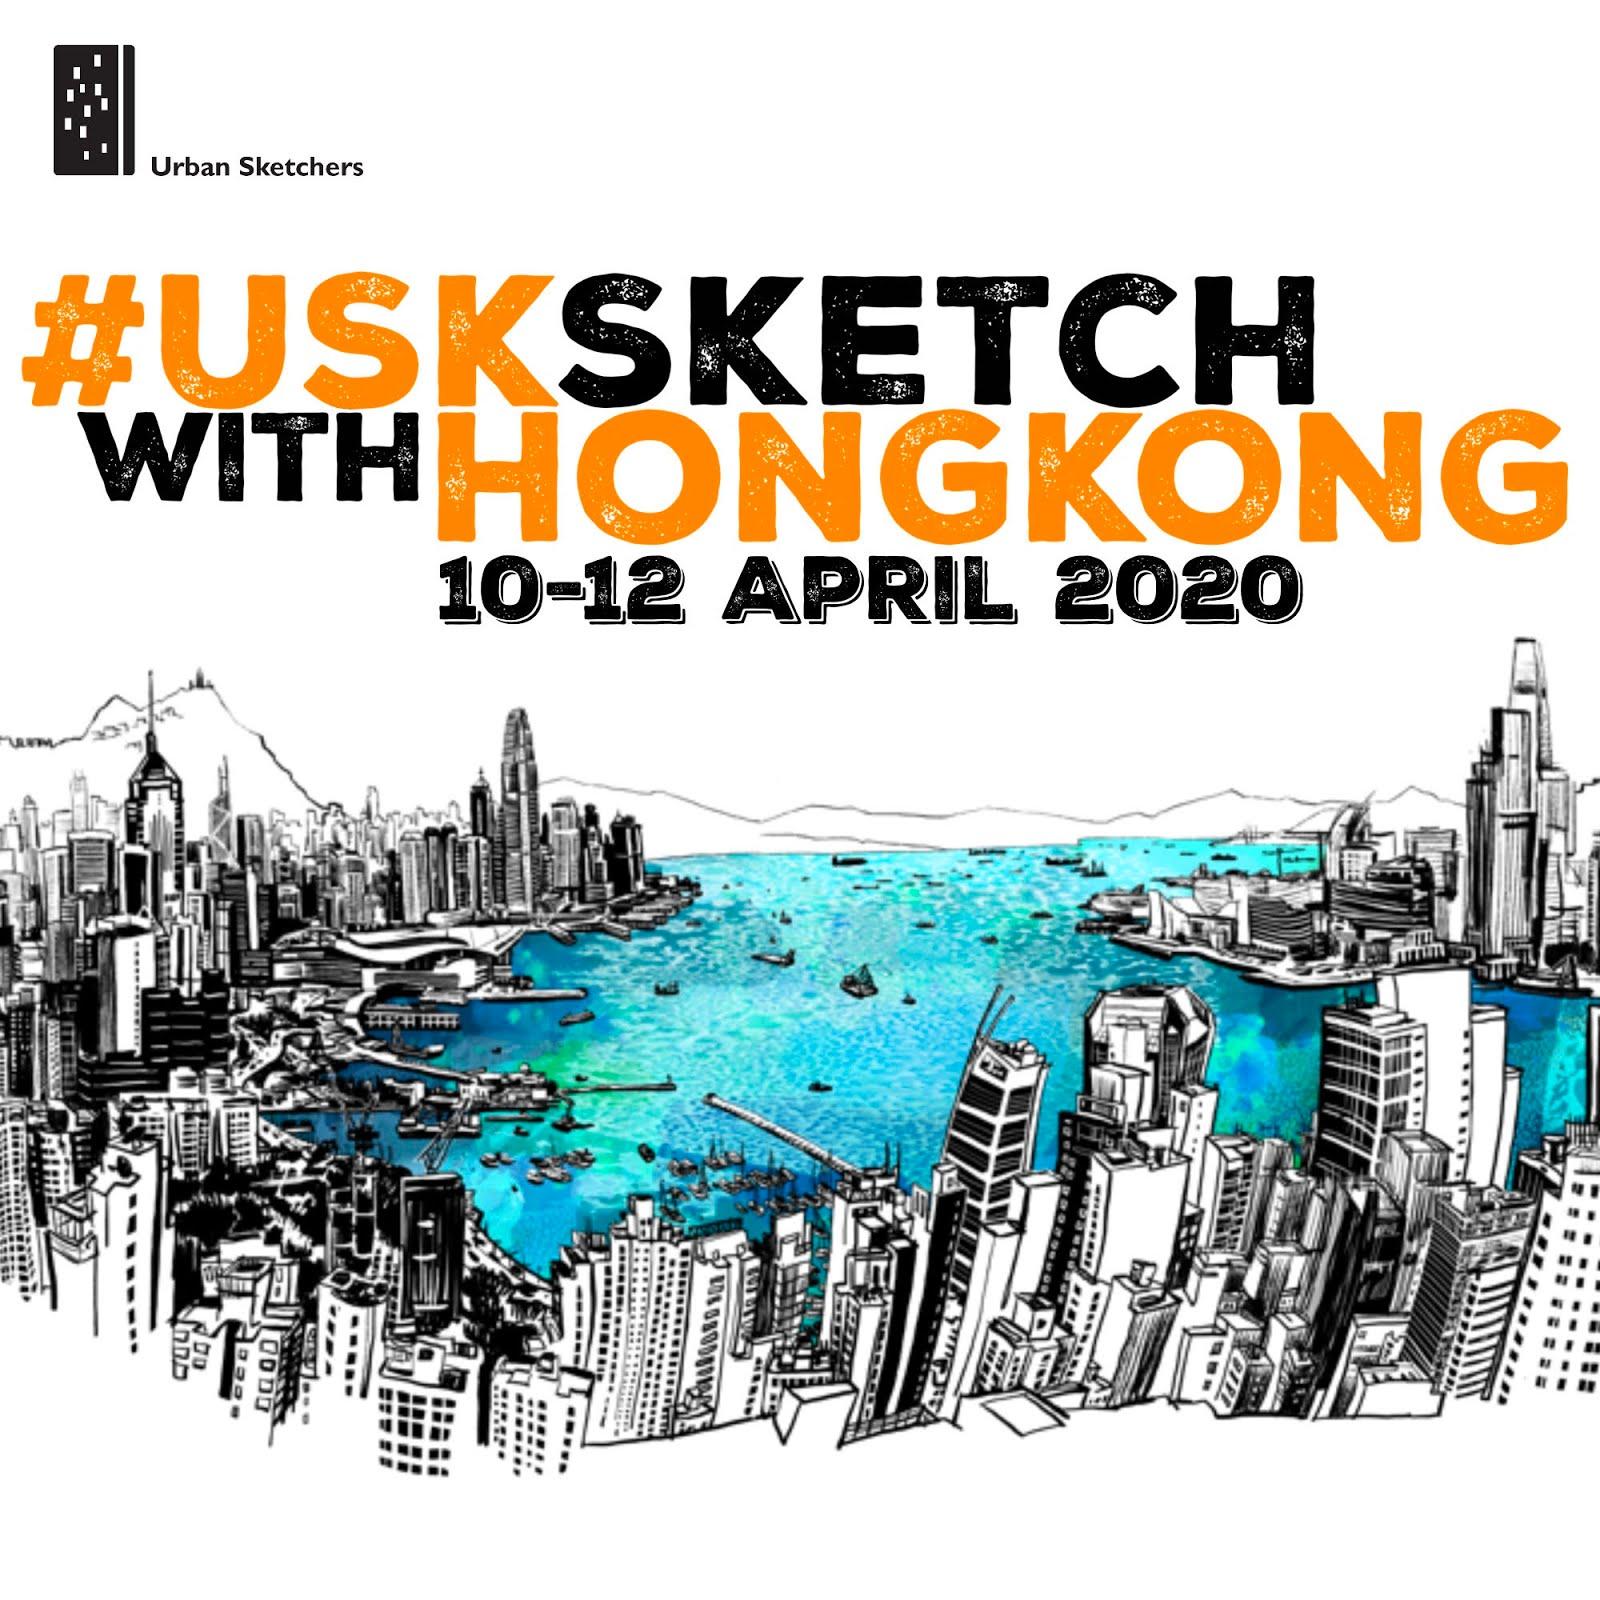 Usk Symposium Hong Kong 2020 News Updates Urban Sketchers